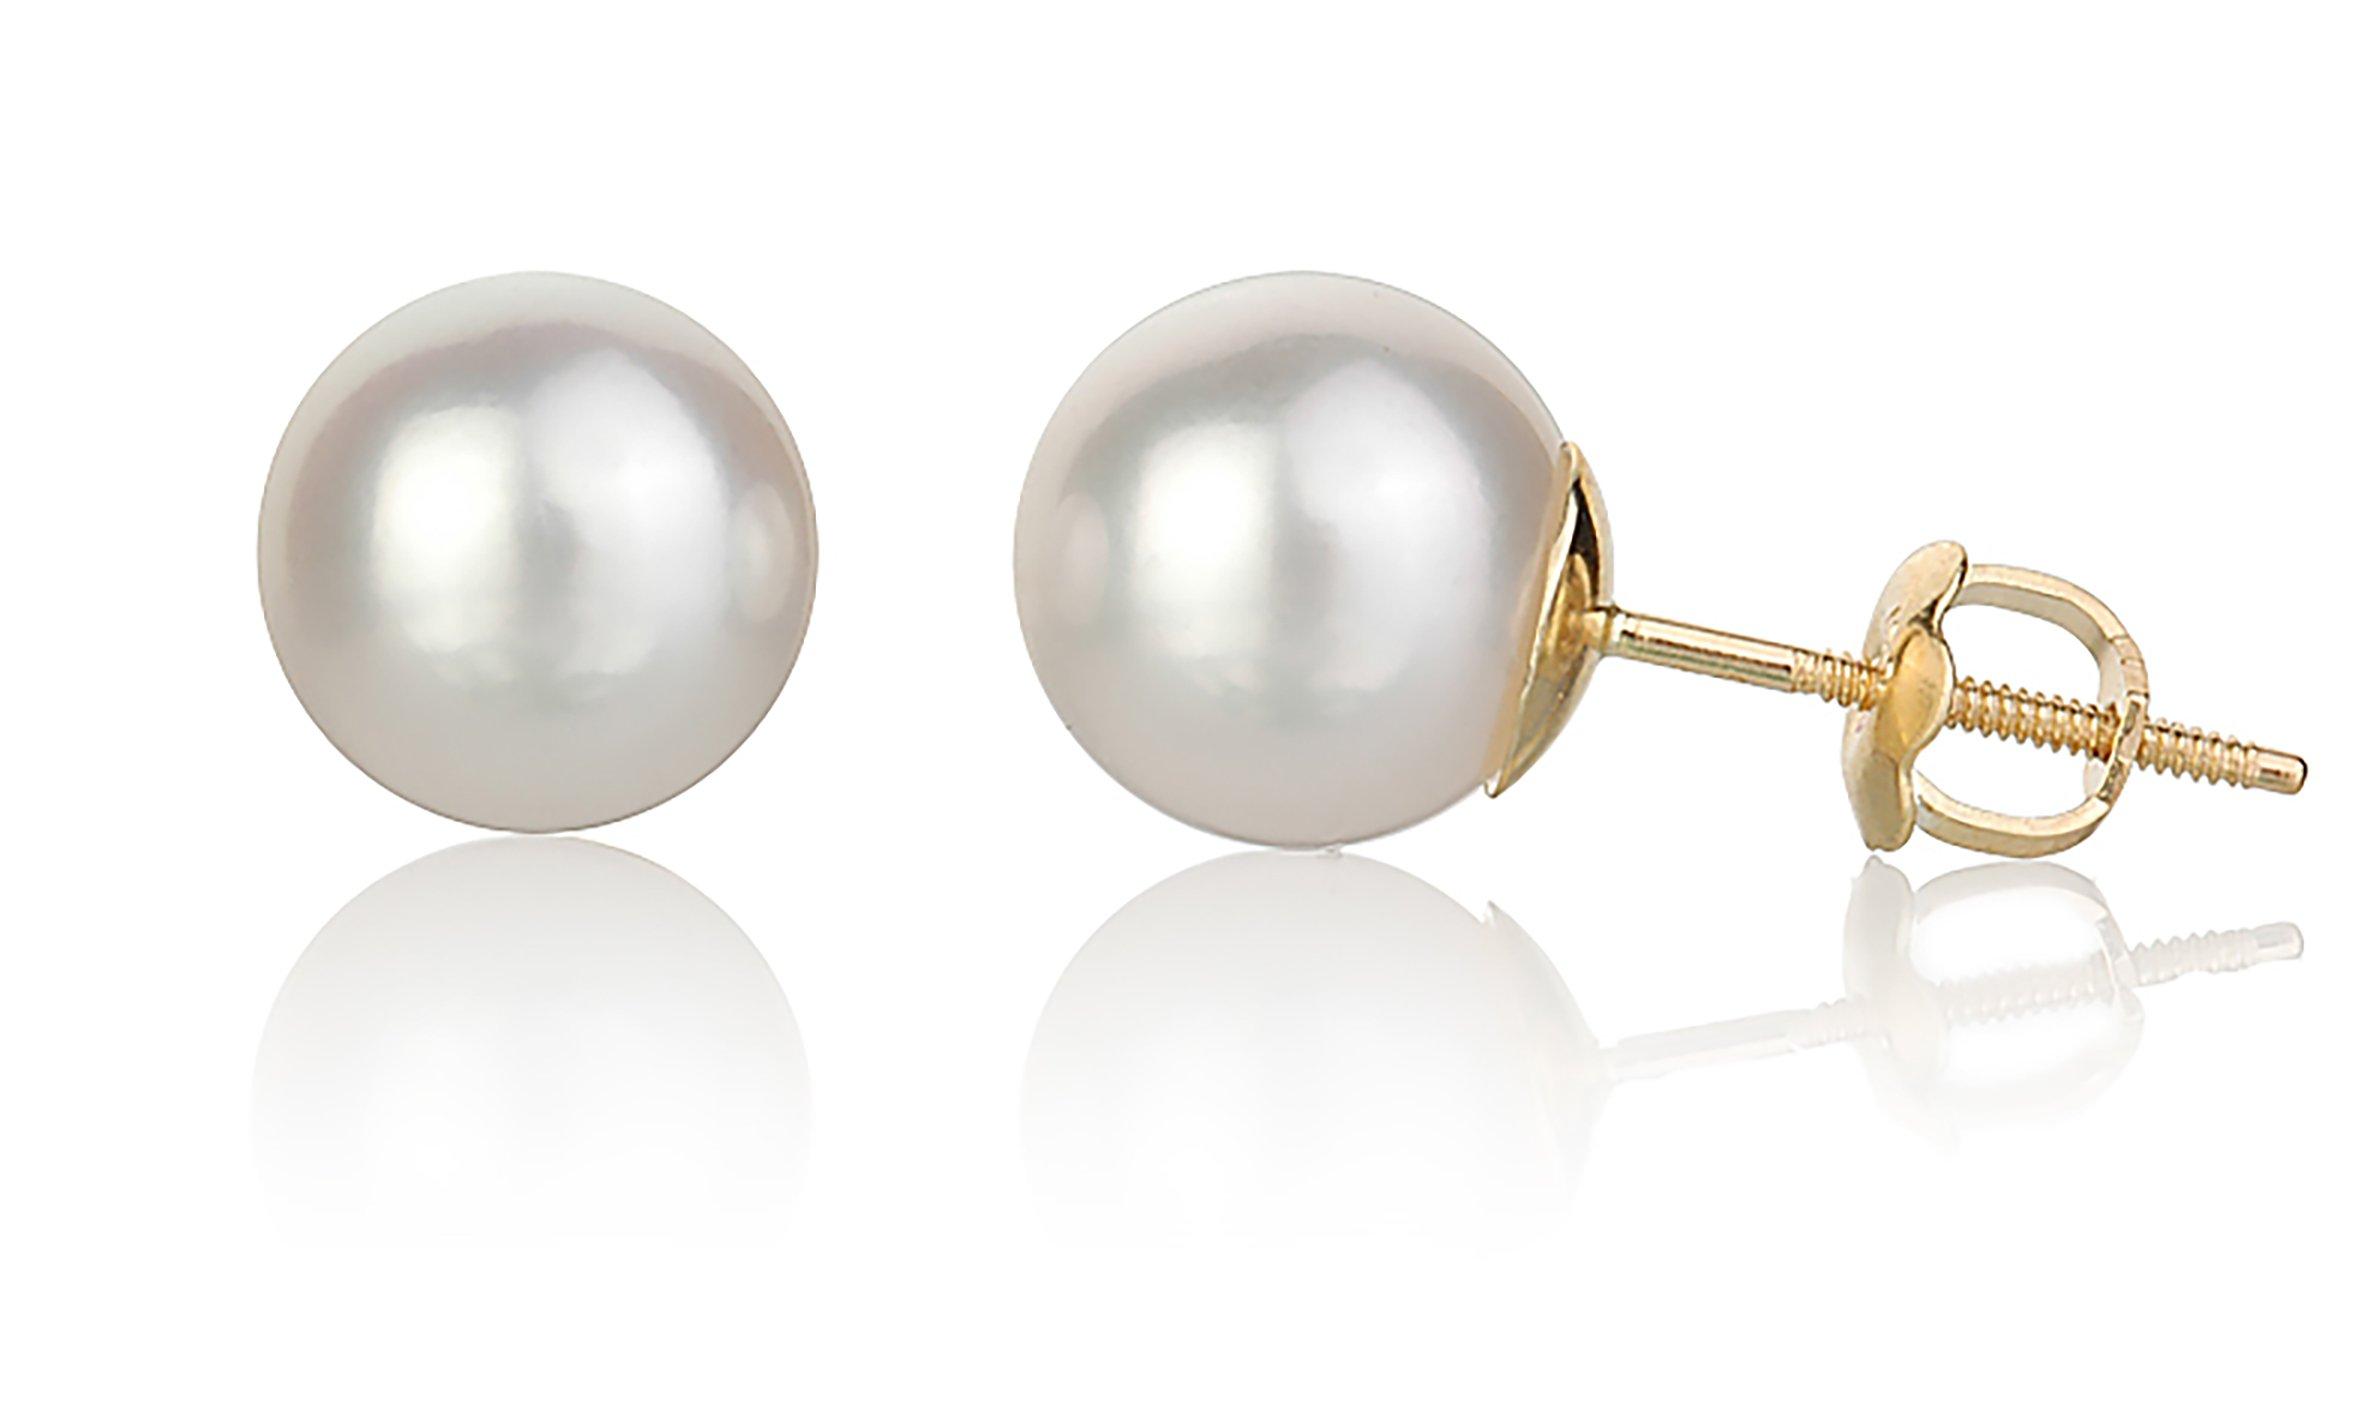 ISAAC WESTMAN White Japanese Akoya Cultured Pearl Stud Earrings (8.5-9mm)   AAA High Luster Pearls   Screw Back